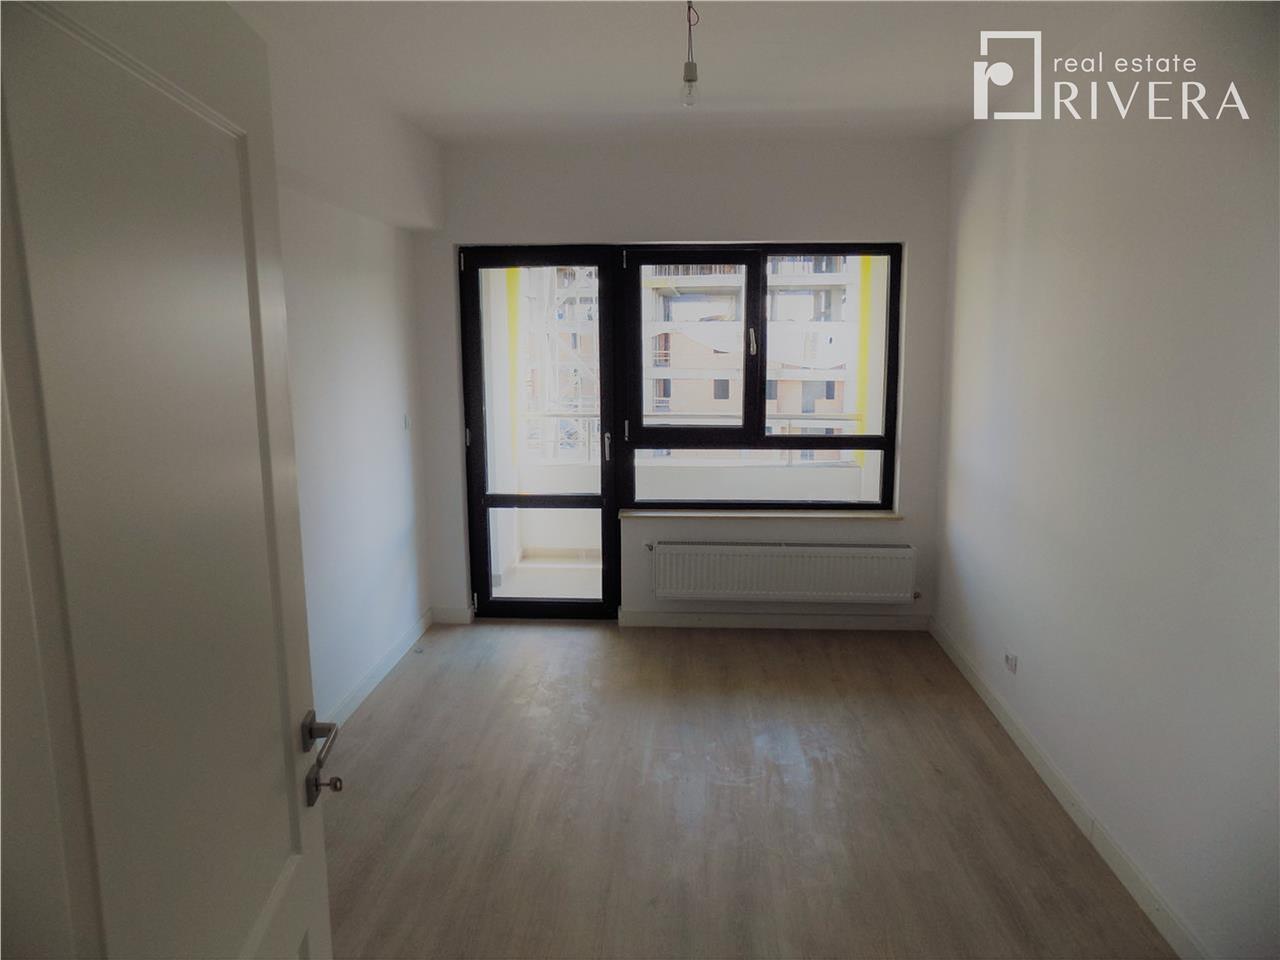 Apartament nou, 1 camera  Cug | Finalizat | La Bulevard, langa statie RATP | Pretabil pentru investitie | Rate dezvoltator